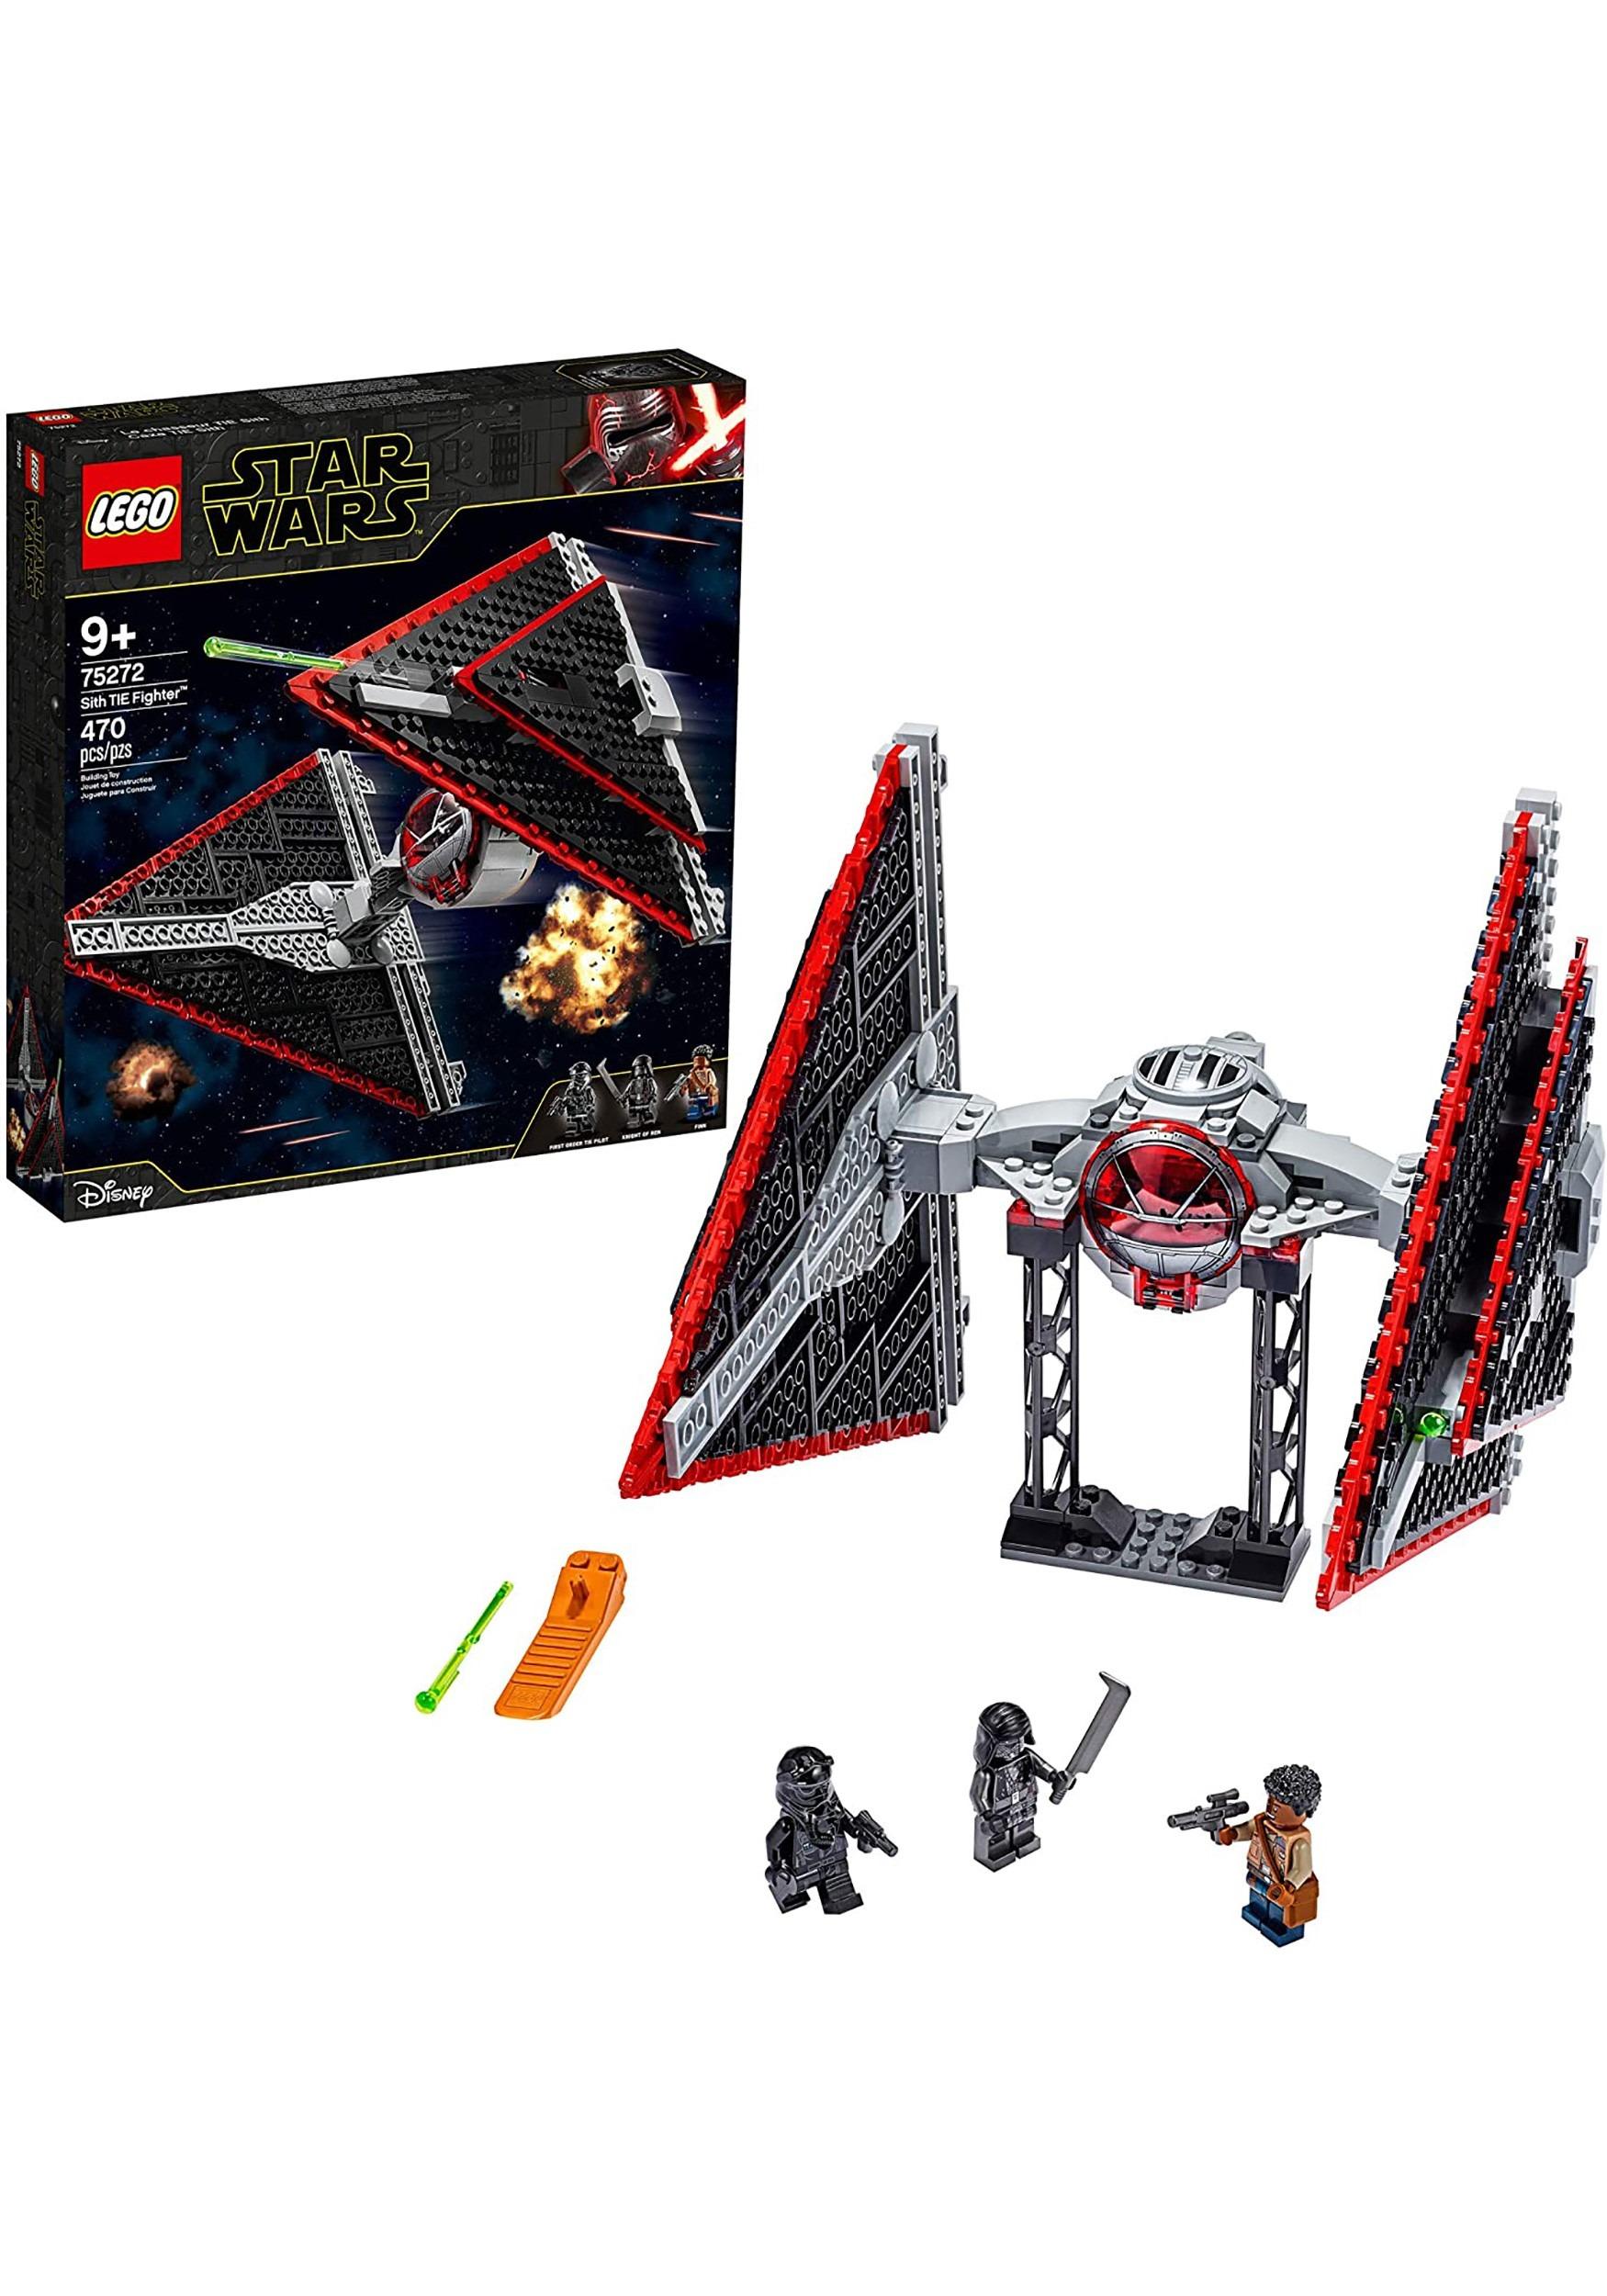 LEGO Star Wars Sith TIE Fighter Building Set